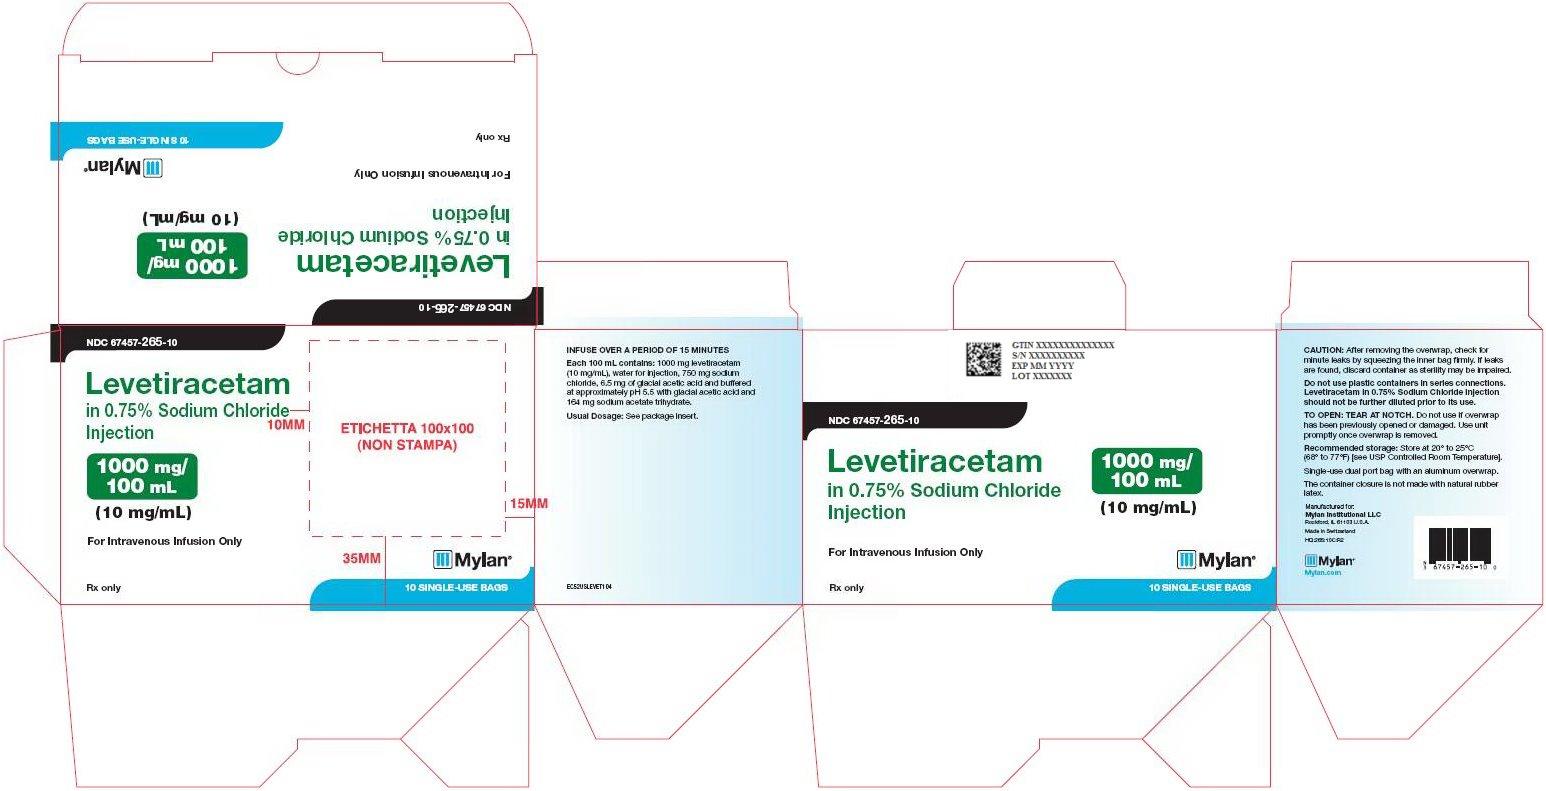 Levetiracetam Sodium Chloride Injection 1000 mg/100 mL Carton Label